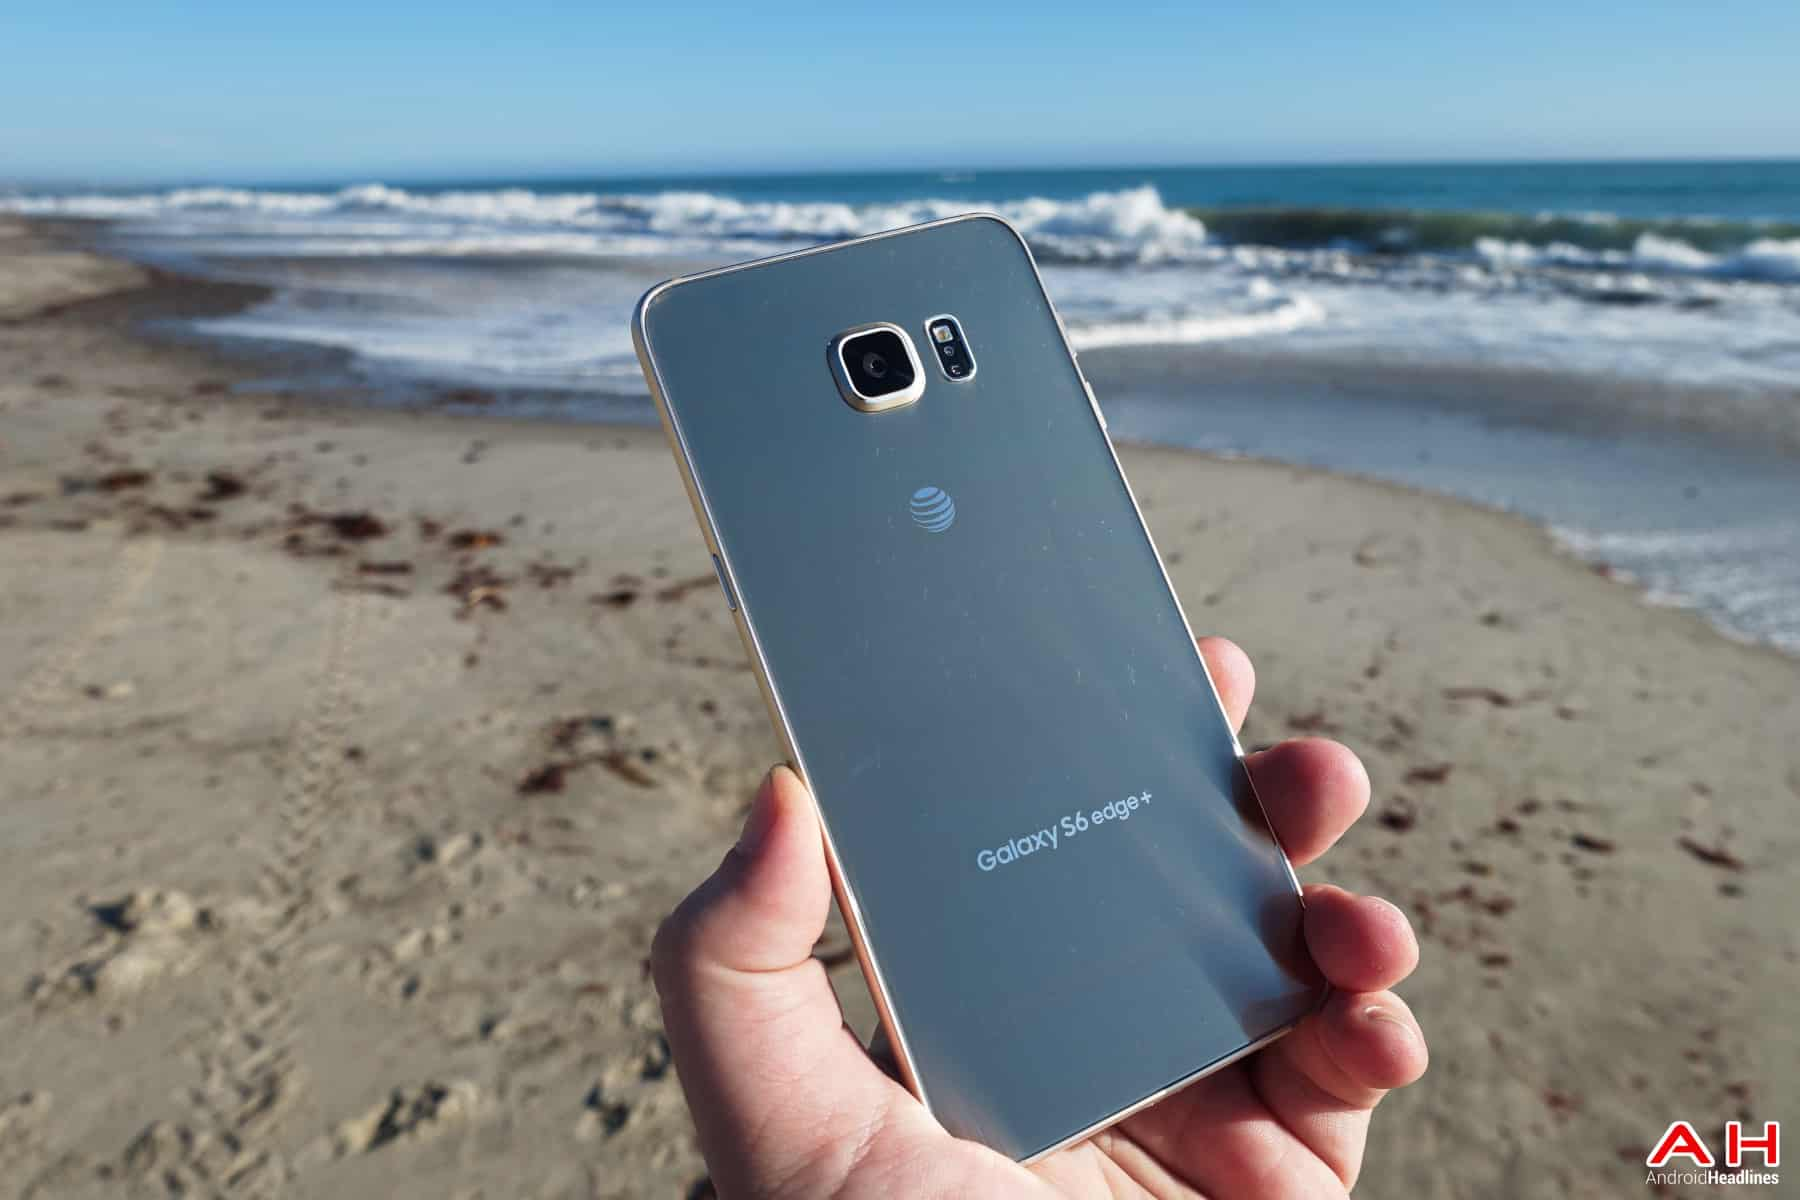 AH Samsung Galaxy 2015 S6 Plus + Chris-5